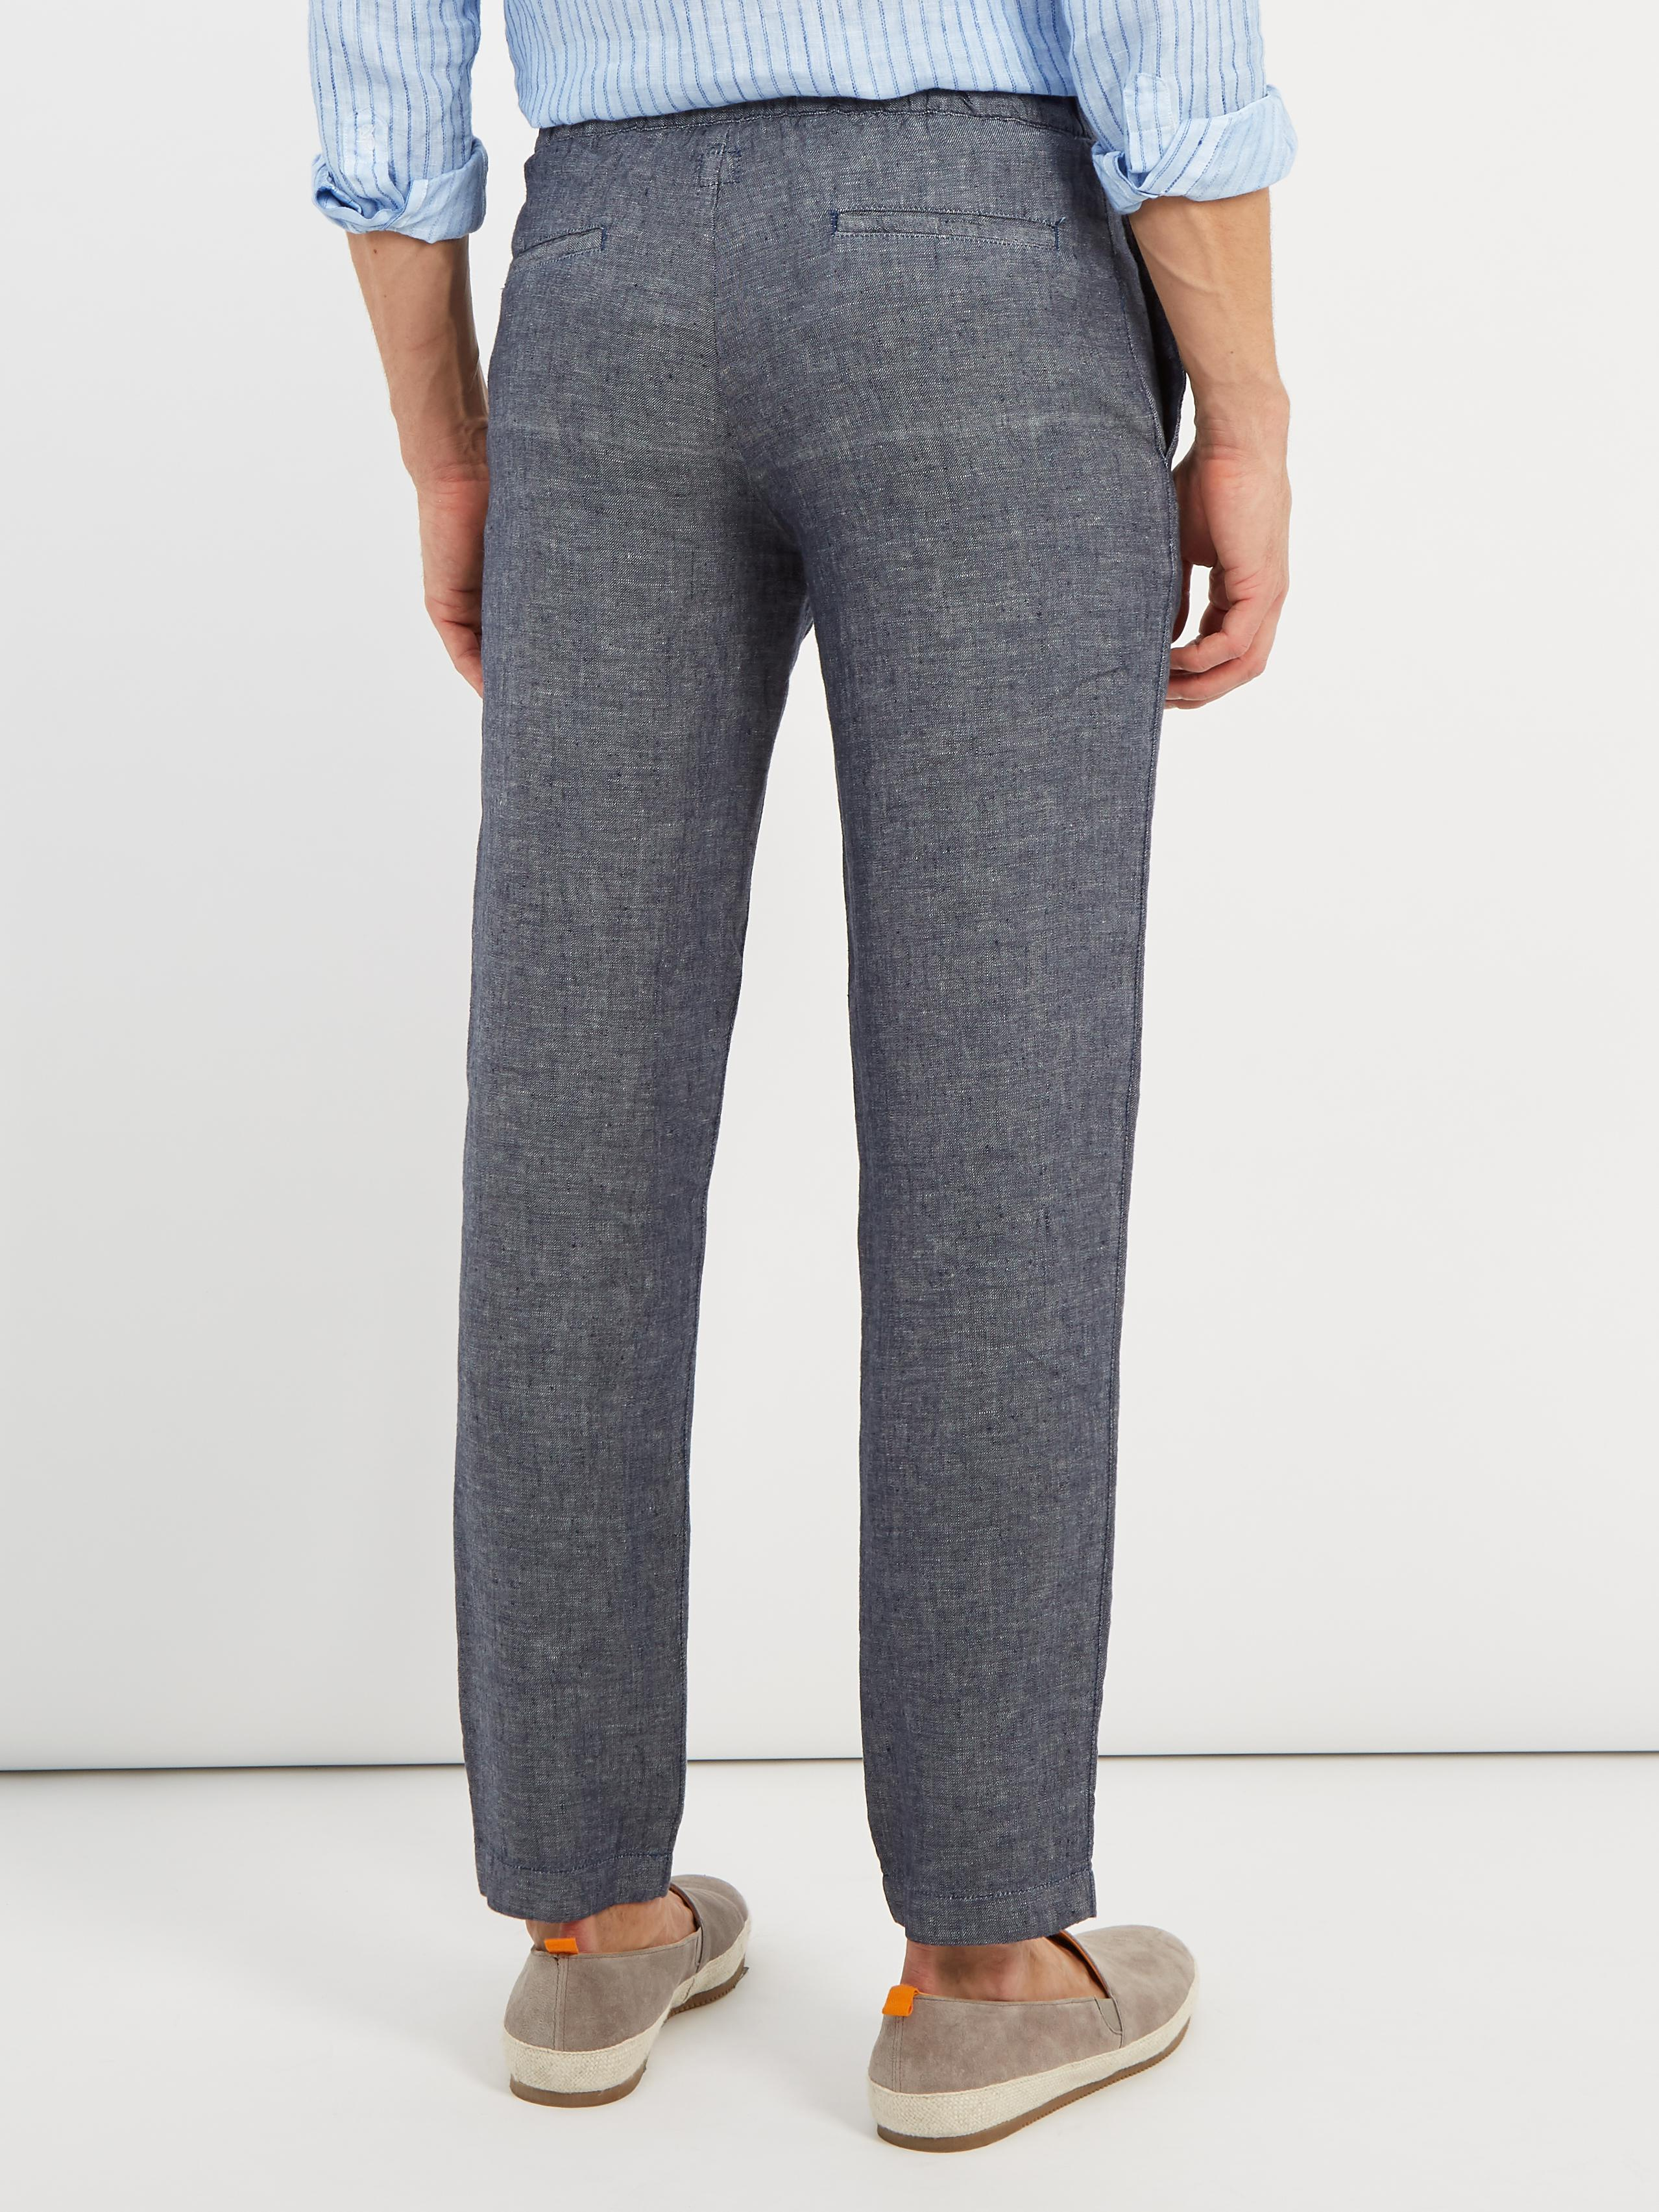 120% Lino Straight-leg Linen Trousers in Grey (Grey) for Men